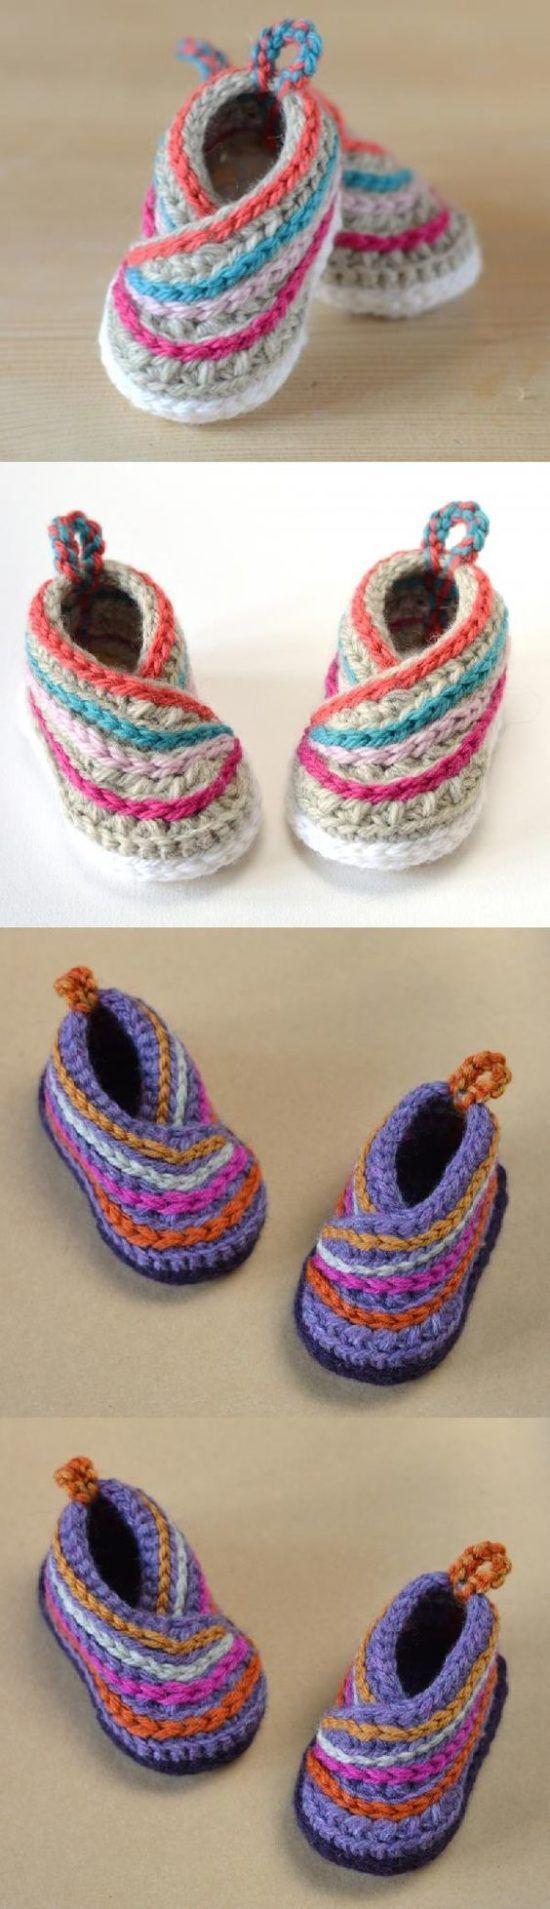 Crochet Kimono Baby Shoes Video Tutorial | Puppe, Babys und ...